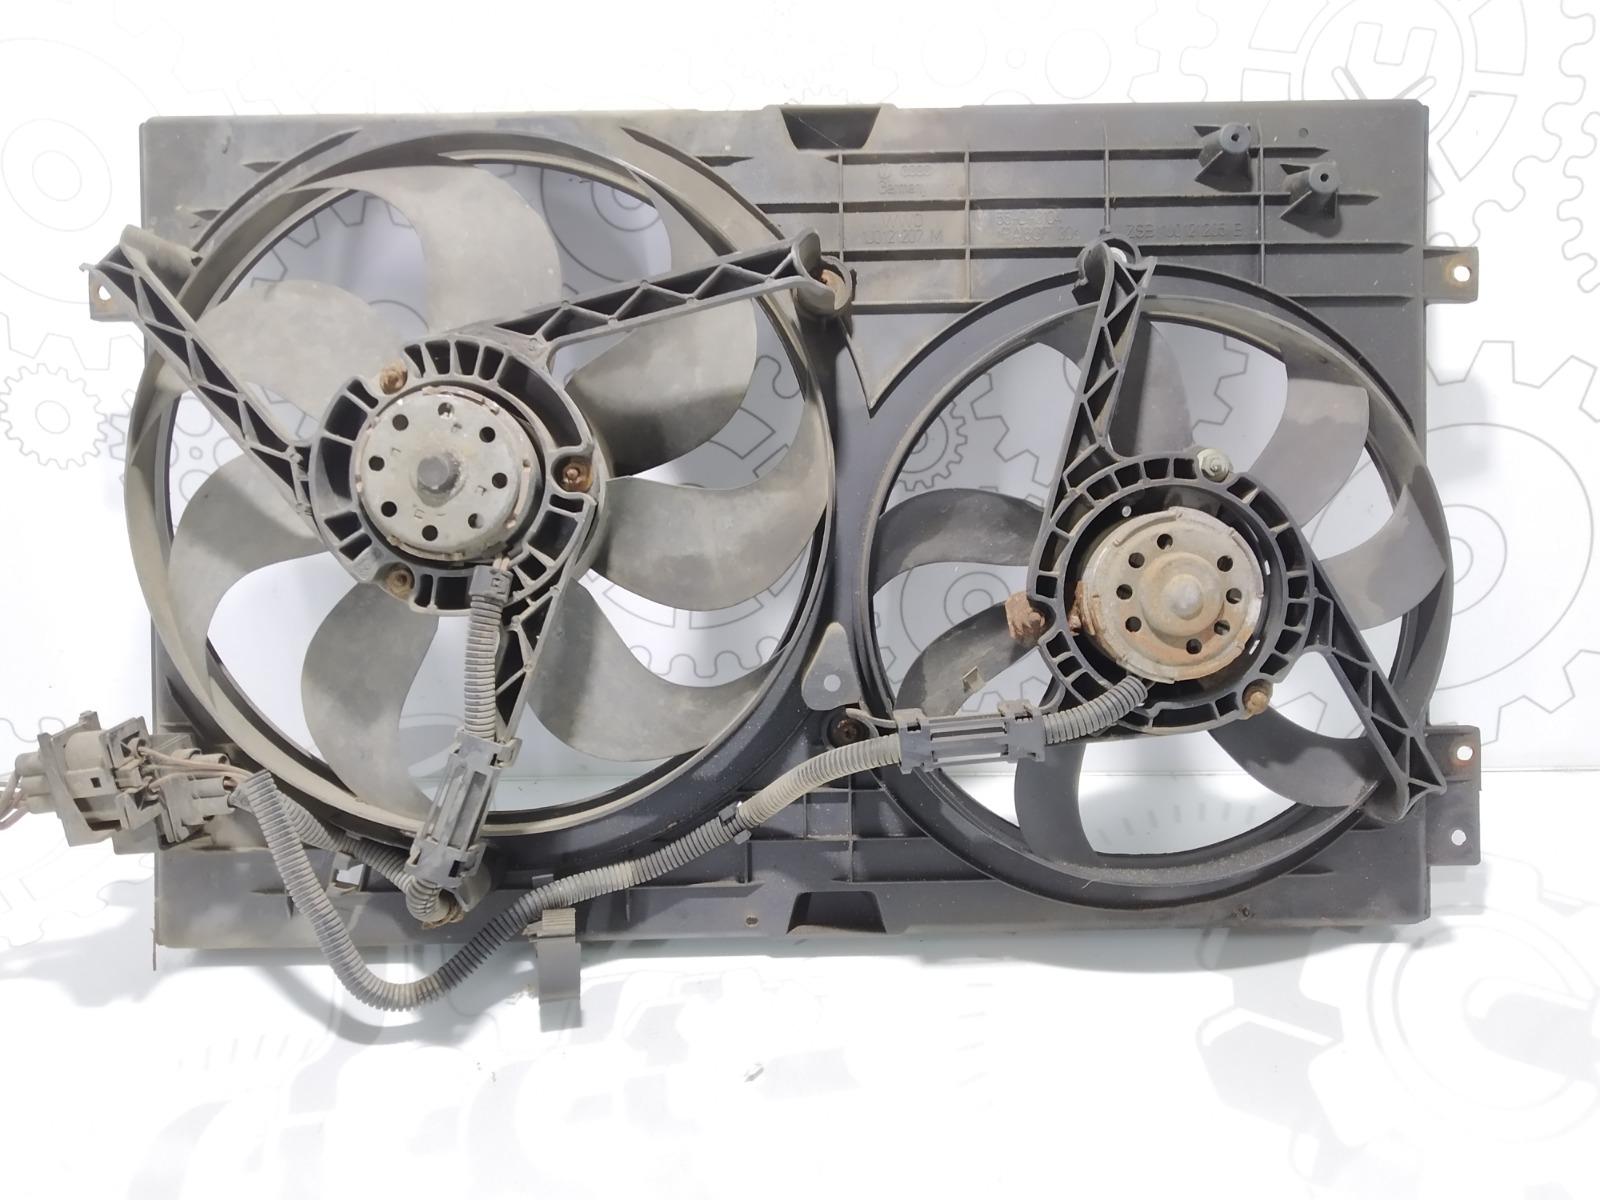 Вентилятор радиатора Skoda Octavia 1.9 TDI 2004 (б/у)